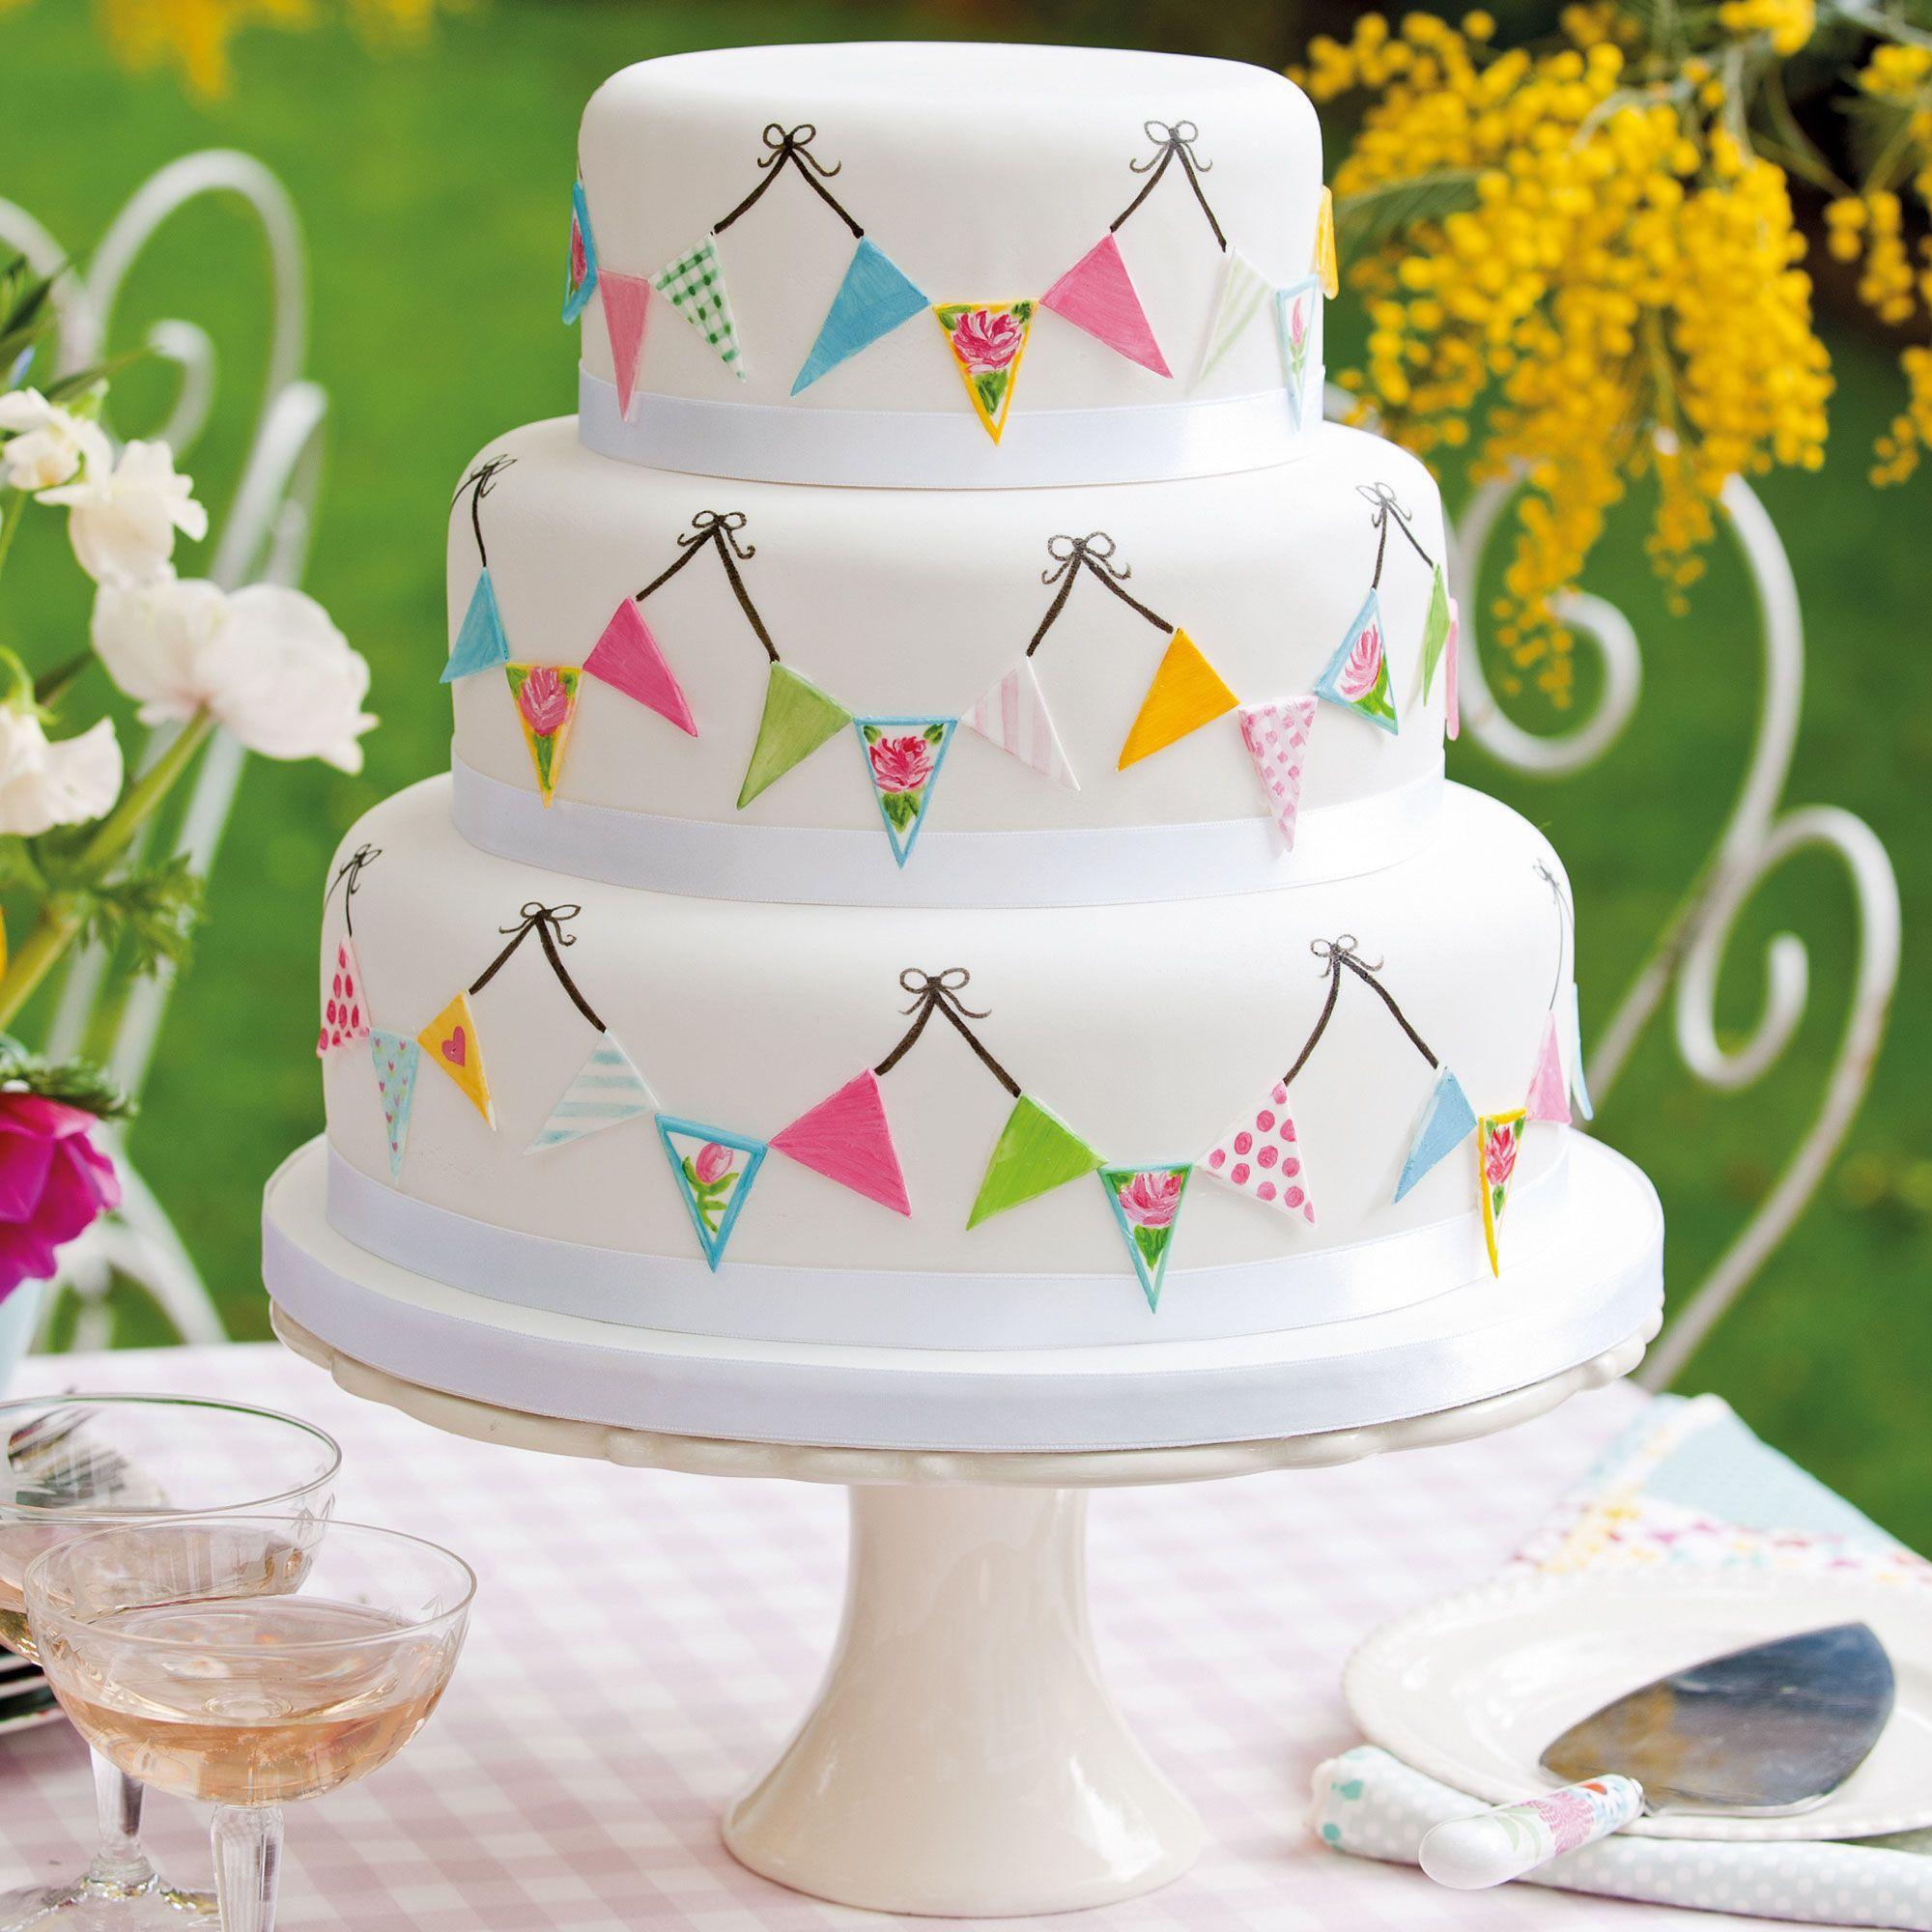 Summer Fete Wedding Cake Recipe | Step guide, Wedding cake and Cake